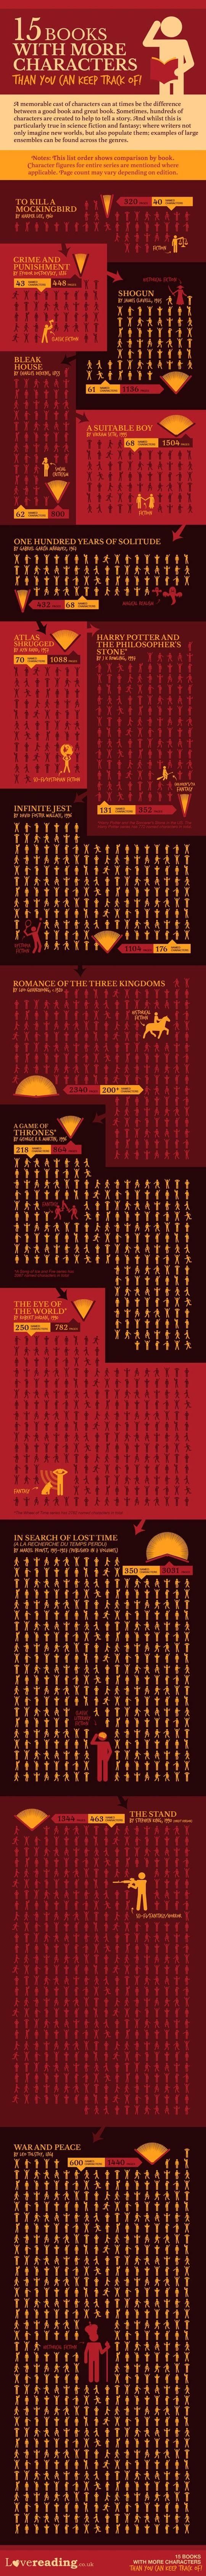 34 best Book Nerd Graphics images on Pinterest   Book nerd, Book ...